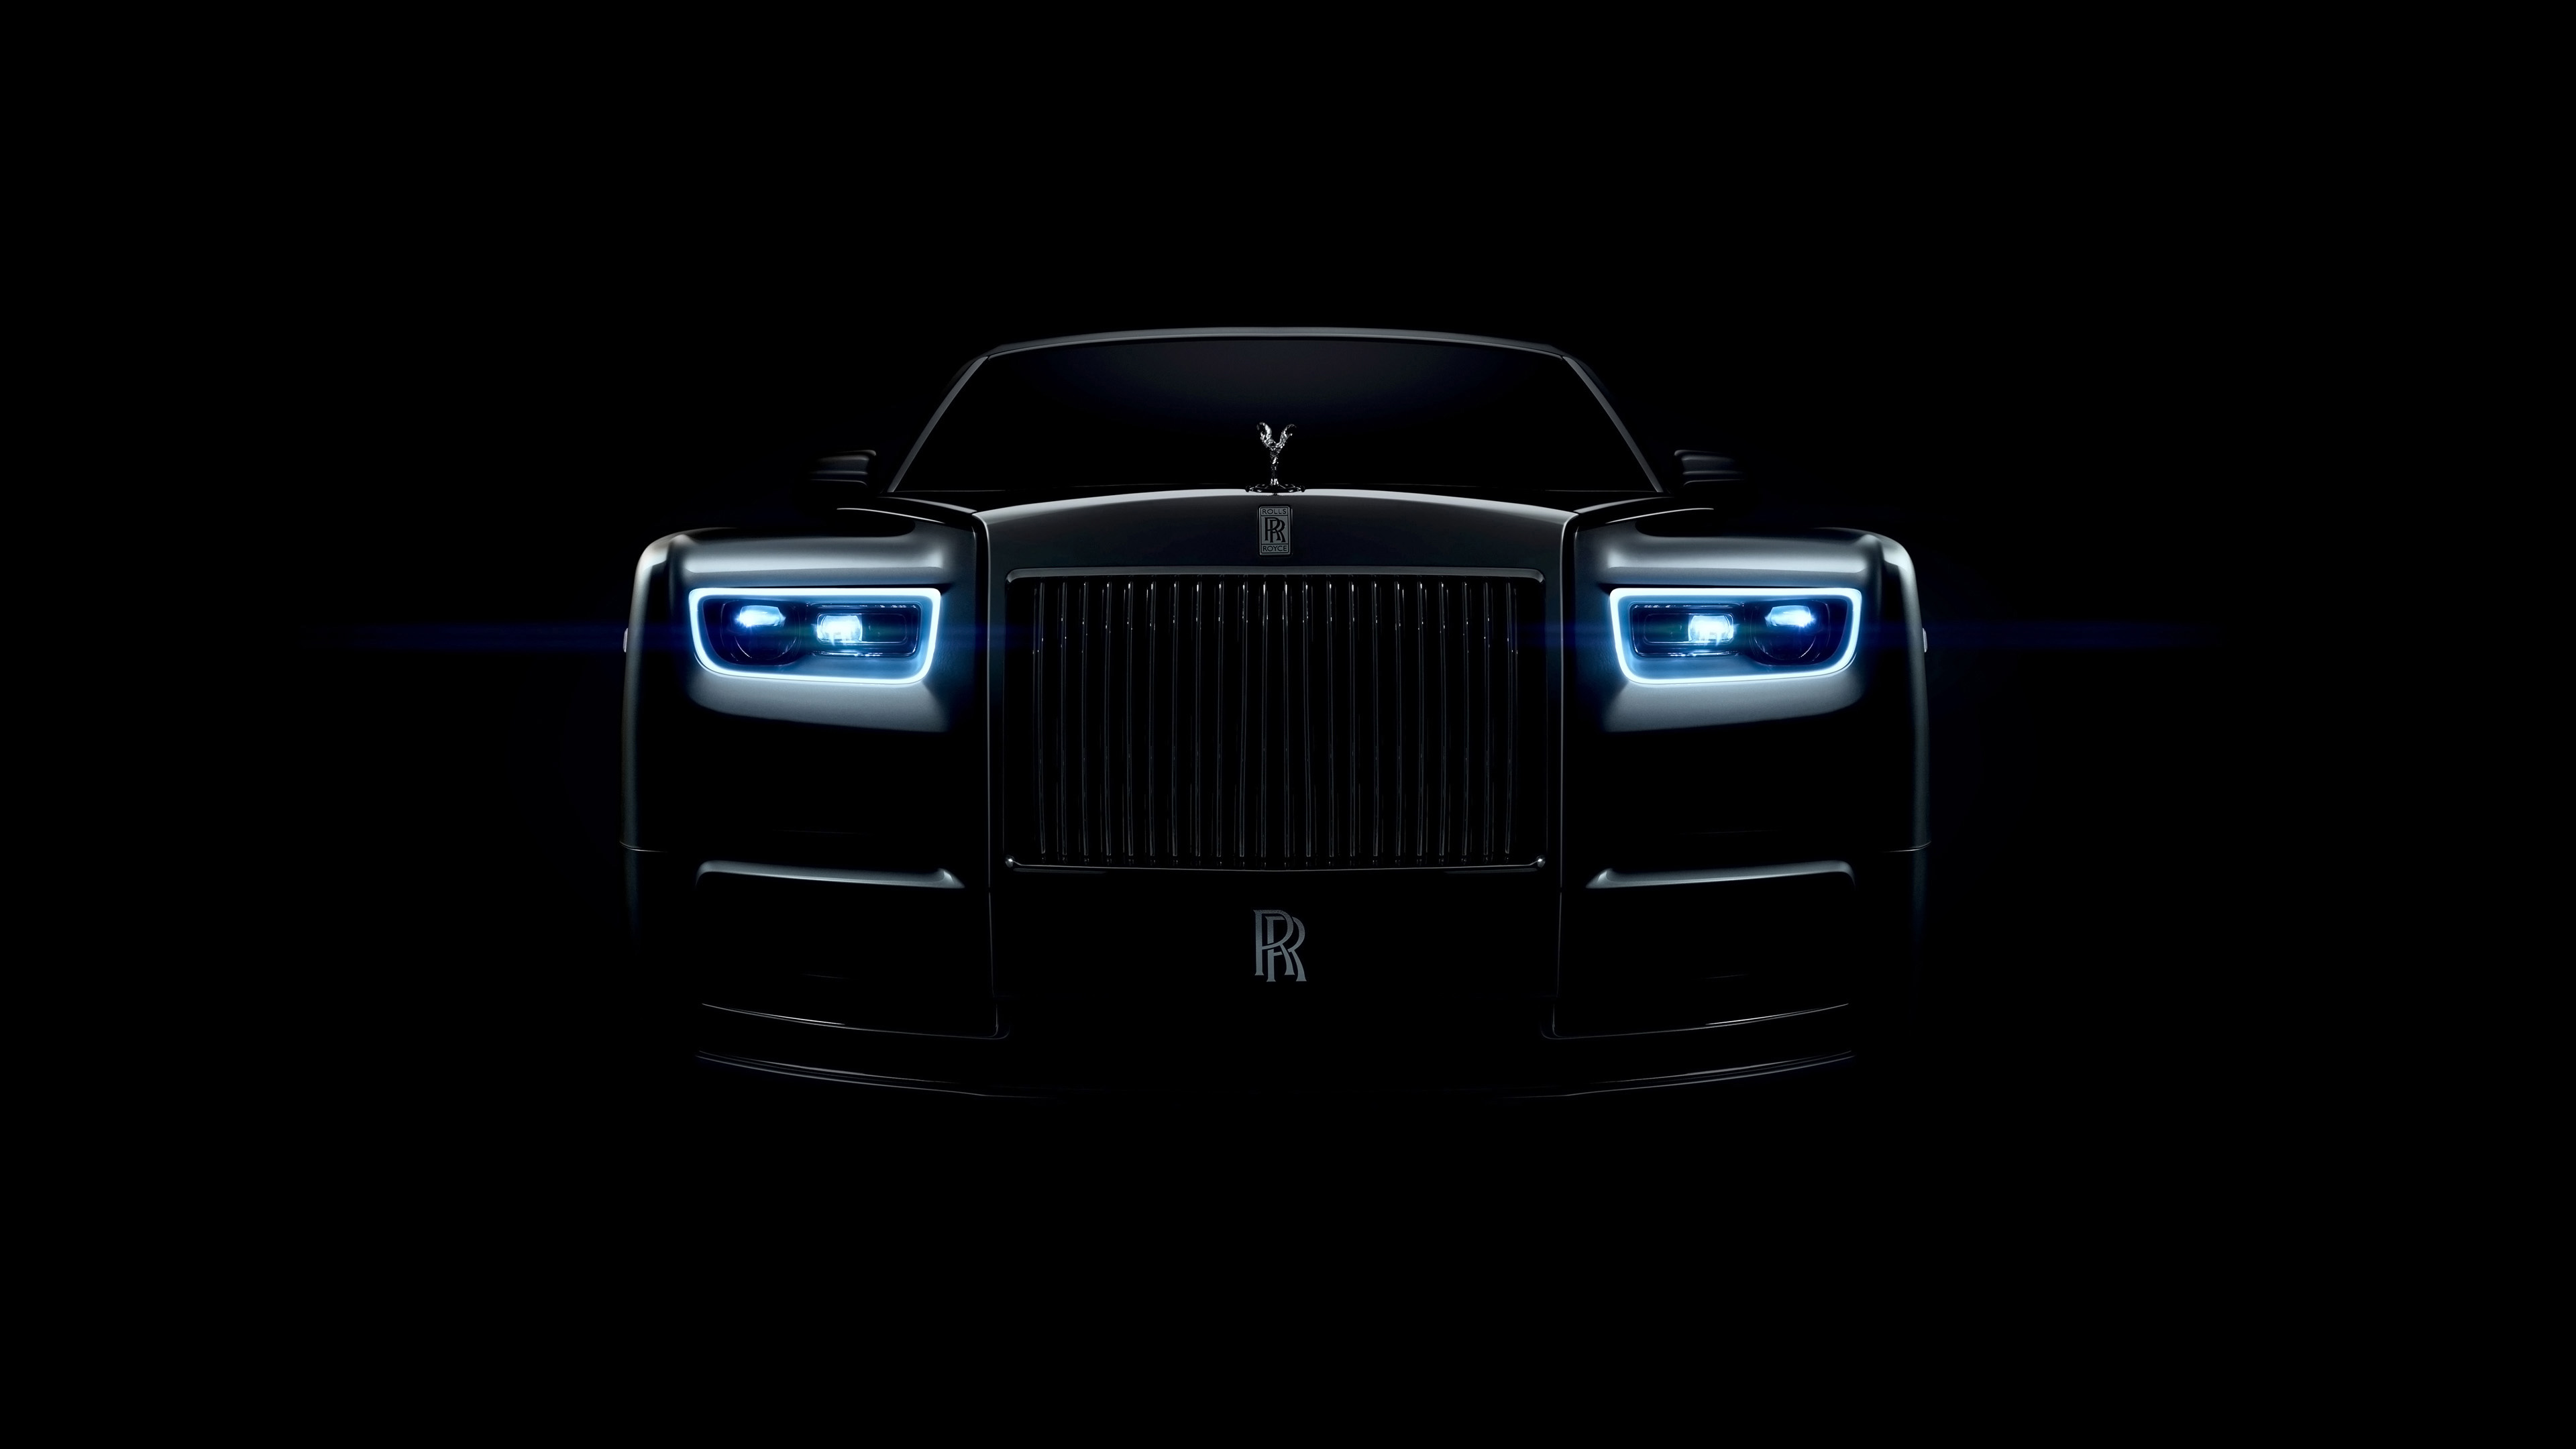 2018 Rolls Royce Phantom Wallpaper Hd Car Wallpapers Id 8172